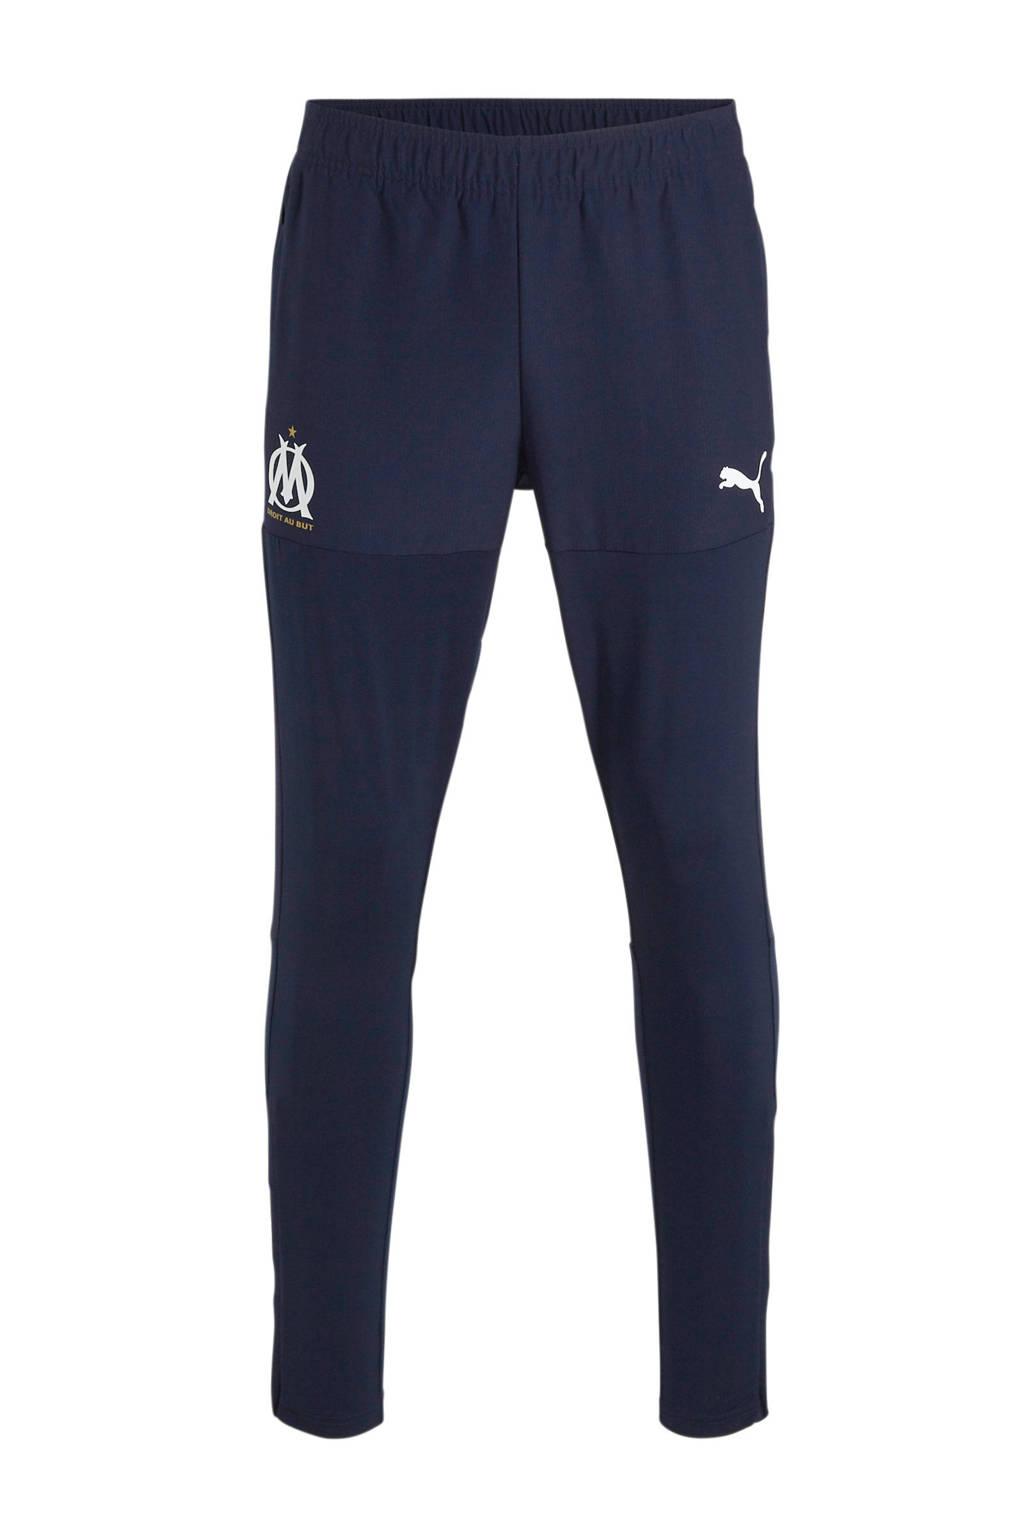 Puma   voetbalbroek donkerblauw, Donkerblauw